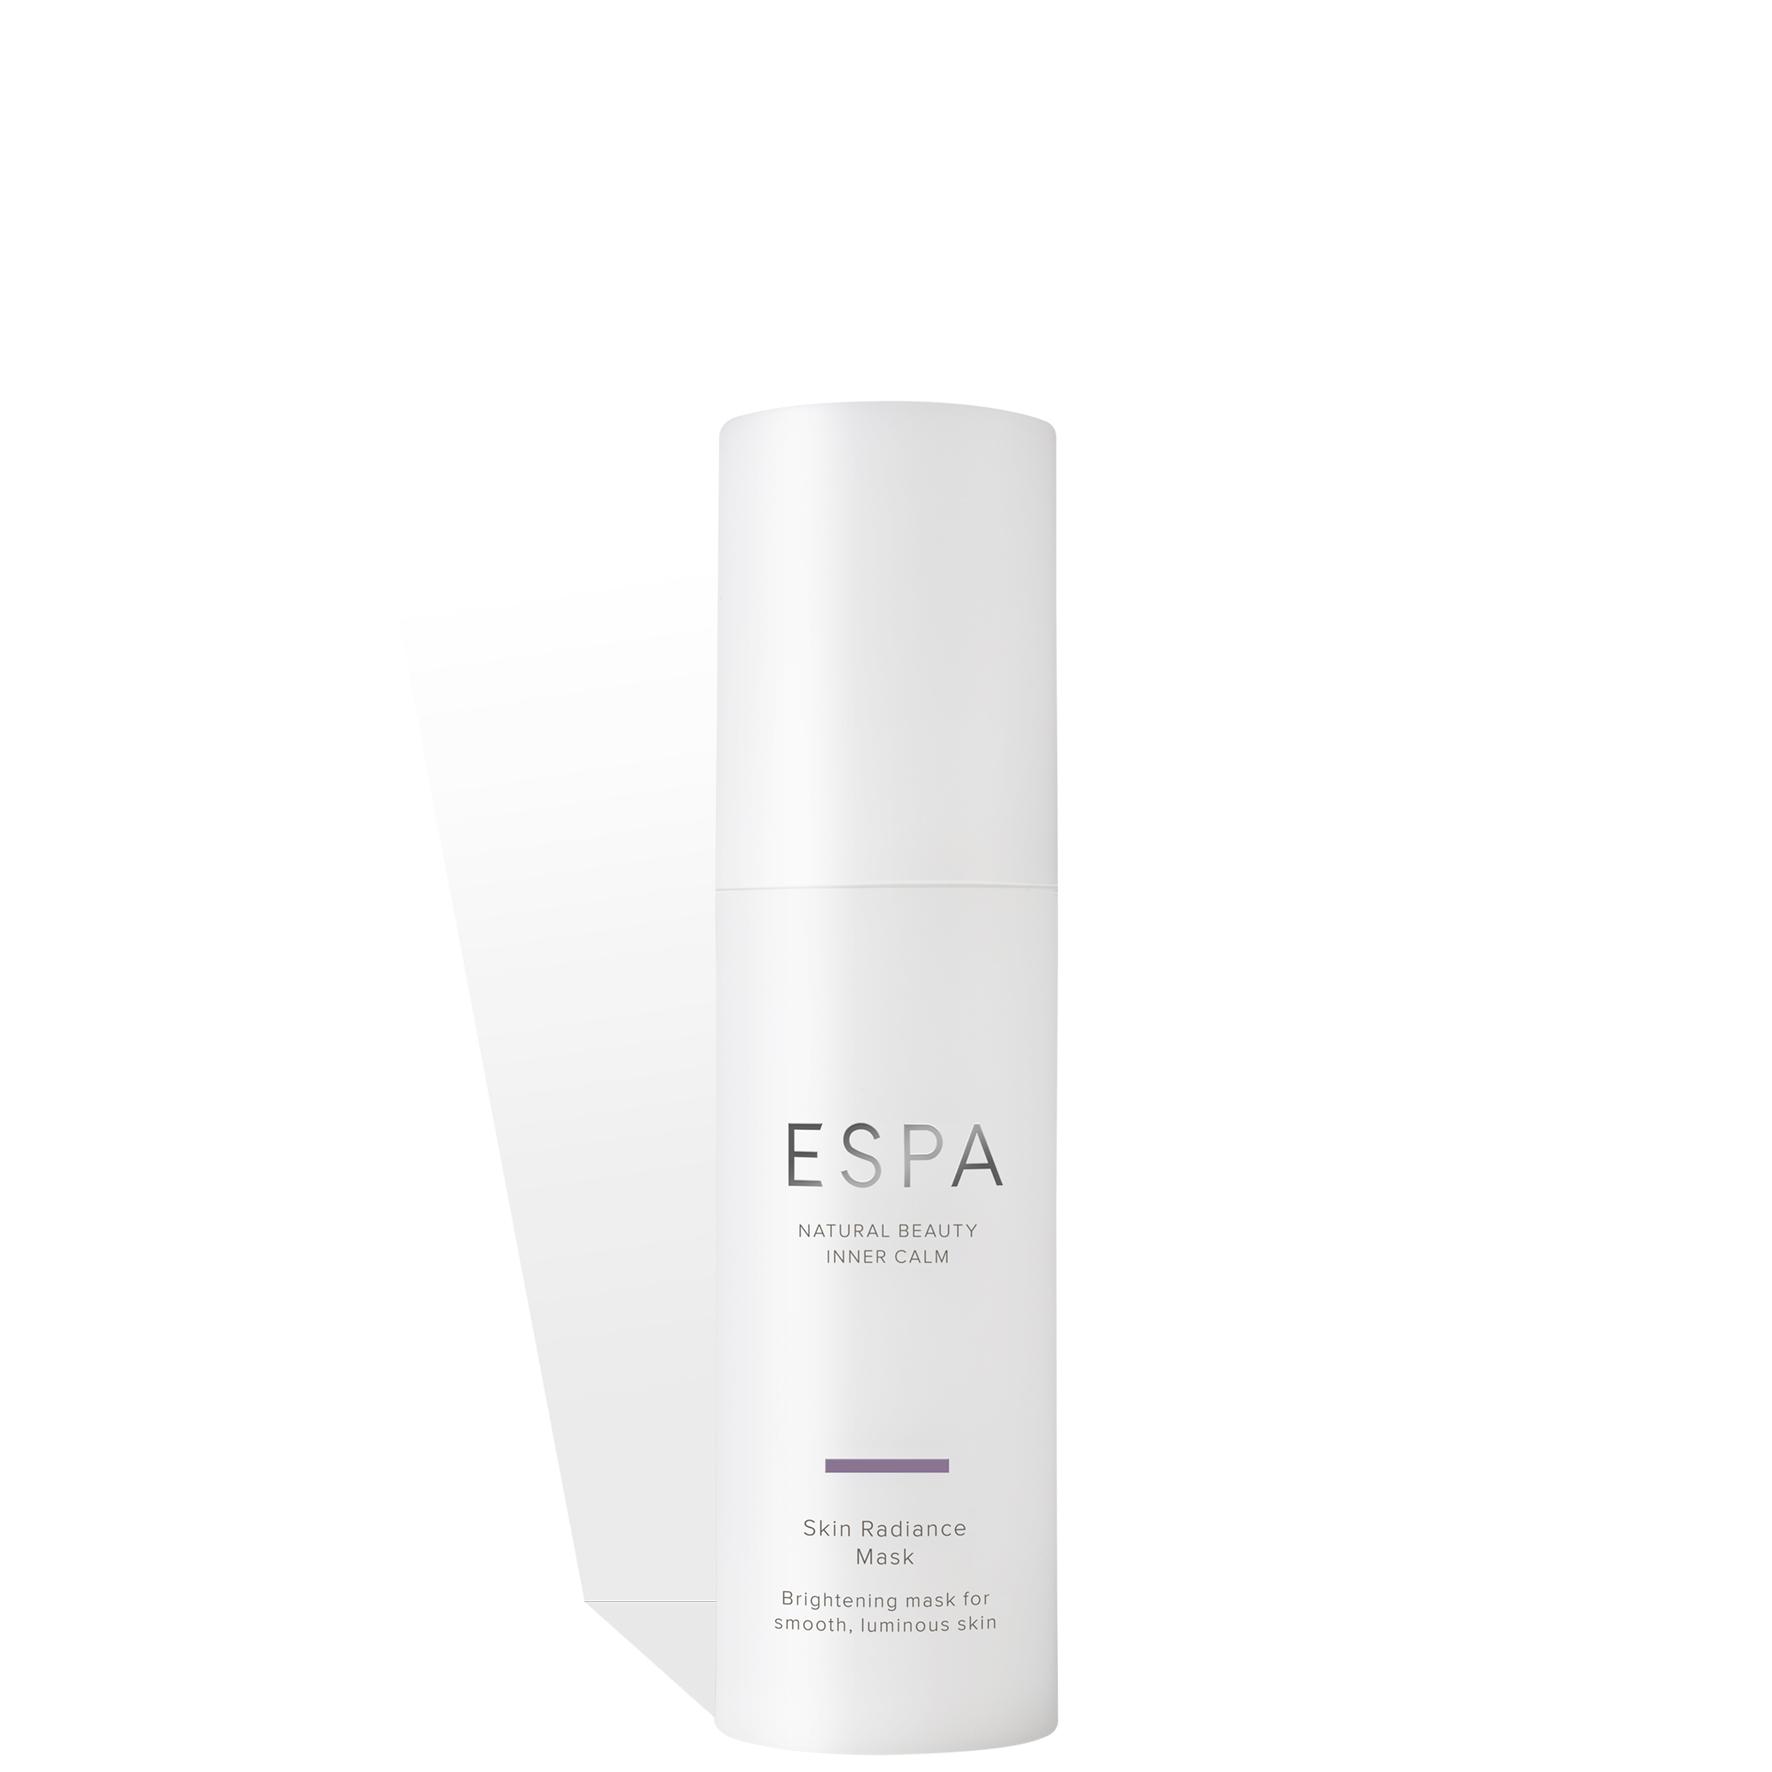 ESPA Skin Radiance Mask